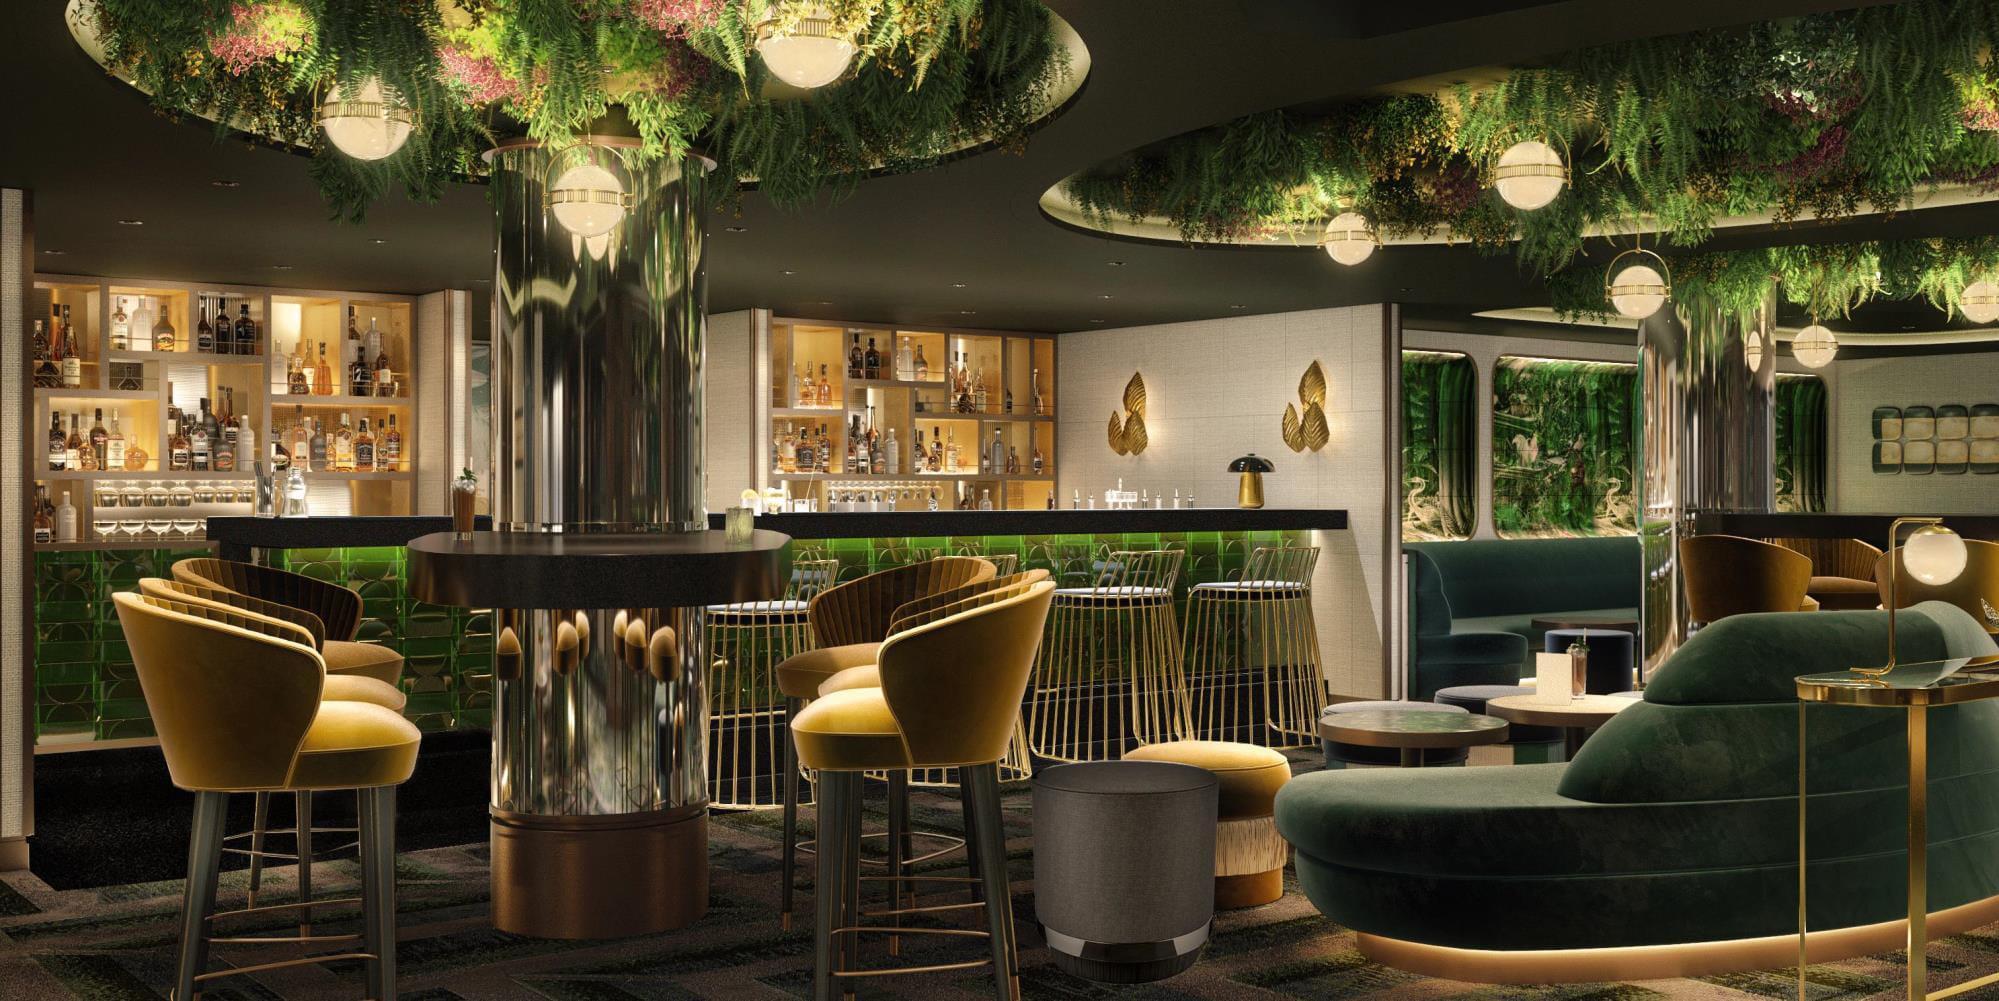 MSC Seashore, Cocktail Bar Chef's Court / © MSC Cruises